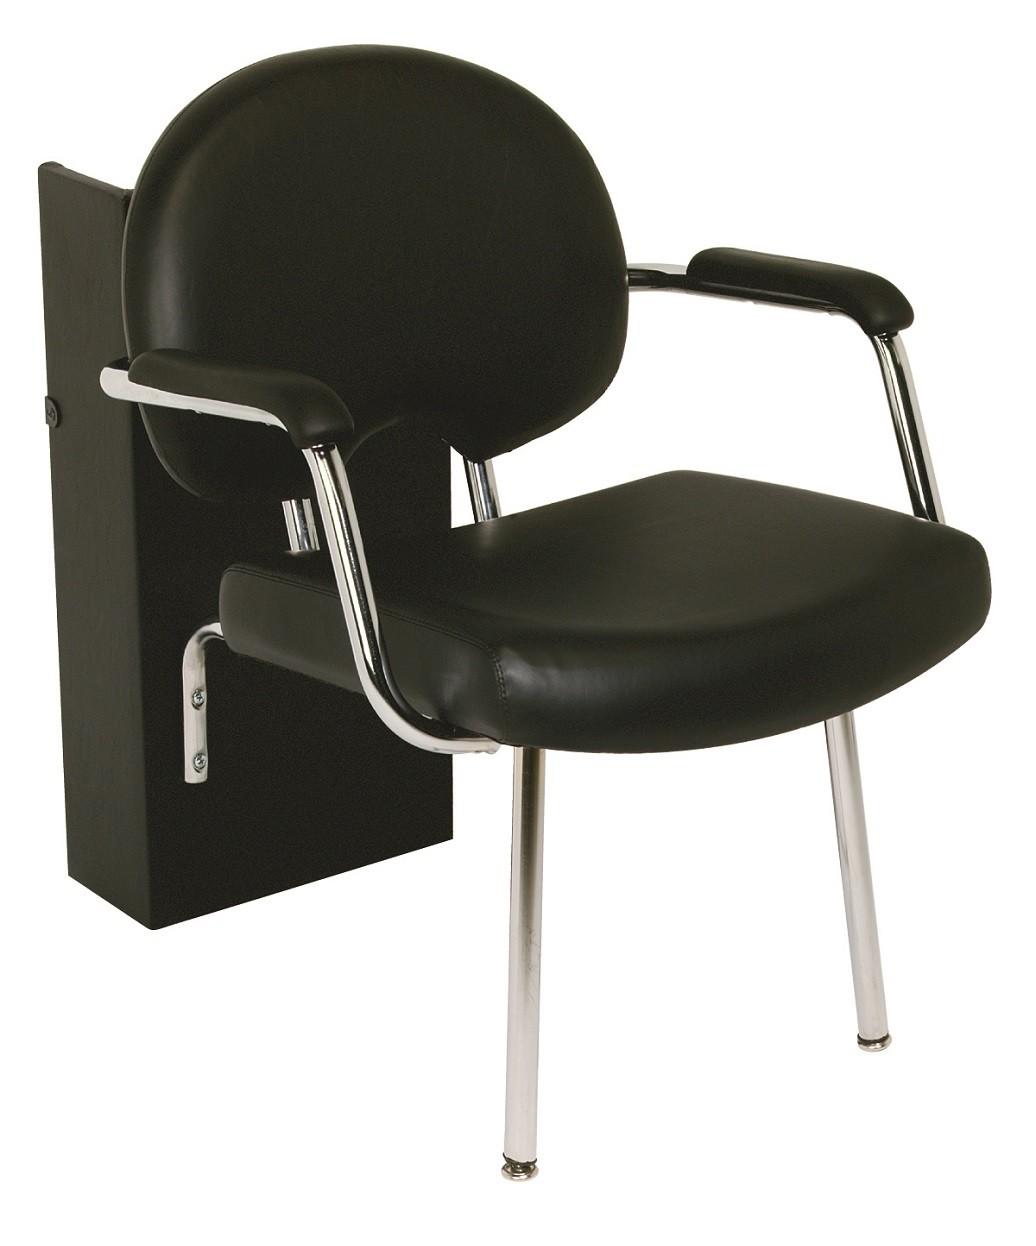 dryer chairs salon childrens lounge chair belvedere ah23c arch